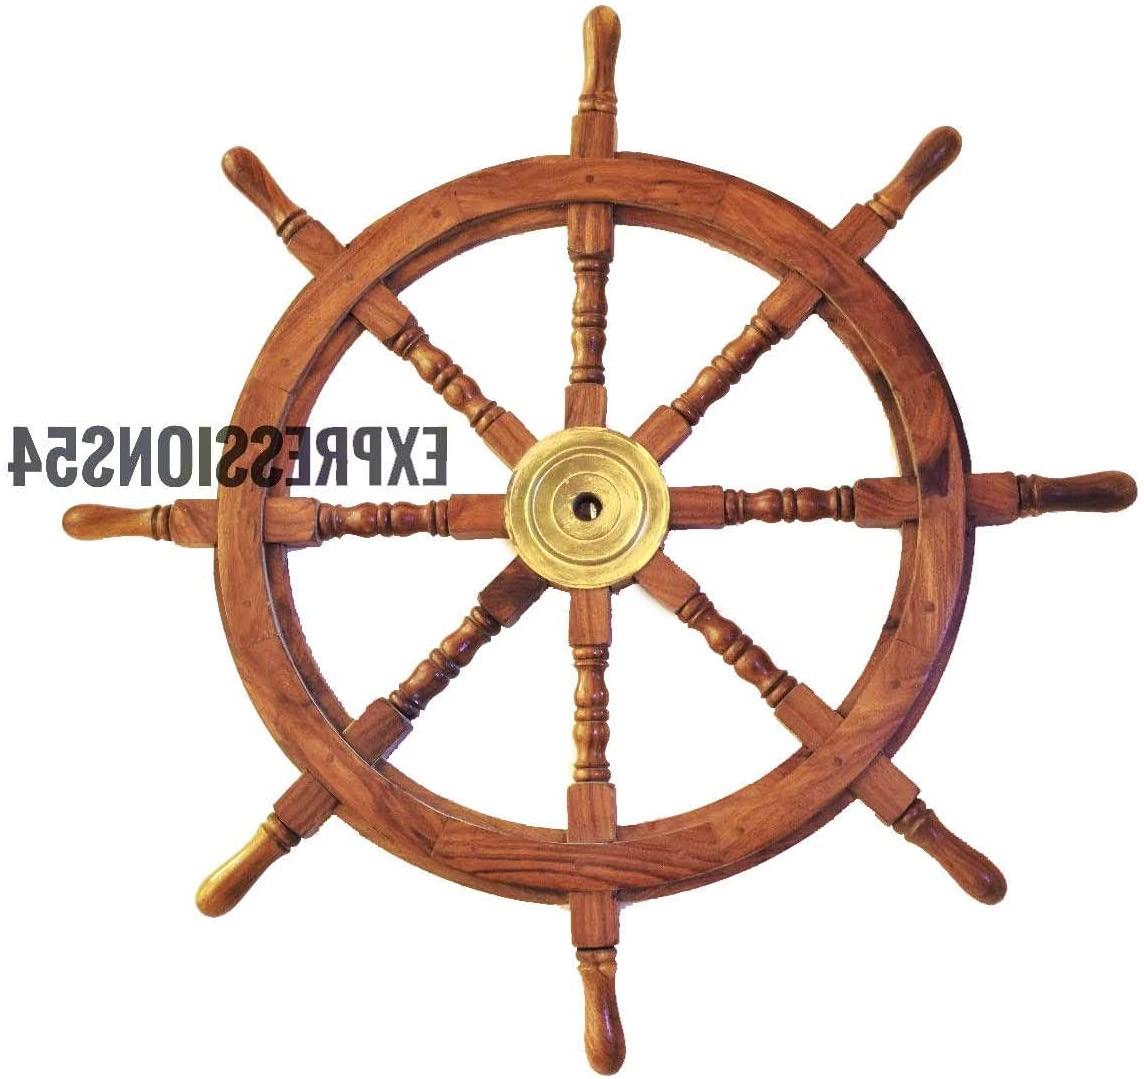 Amazon: Expressions Enterprises Wooden Ship's Wheel Regarding Popular Brown/brass Wood Ship Wheel Wall Décor (View 3 of 20)